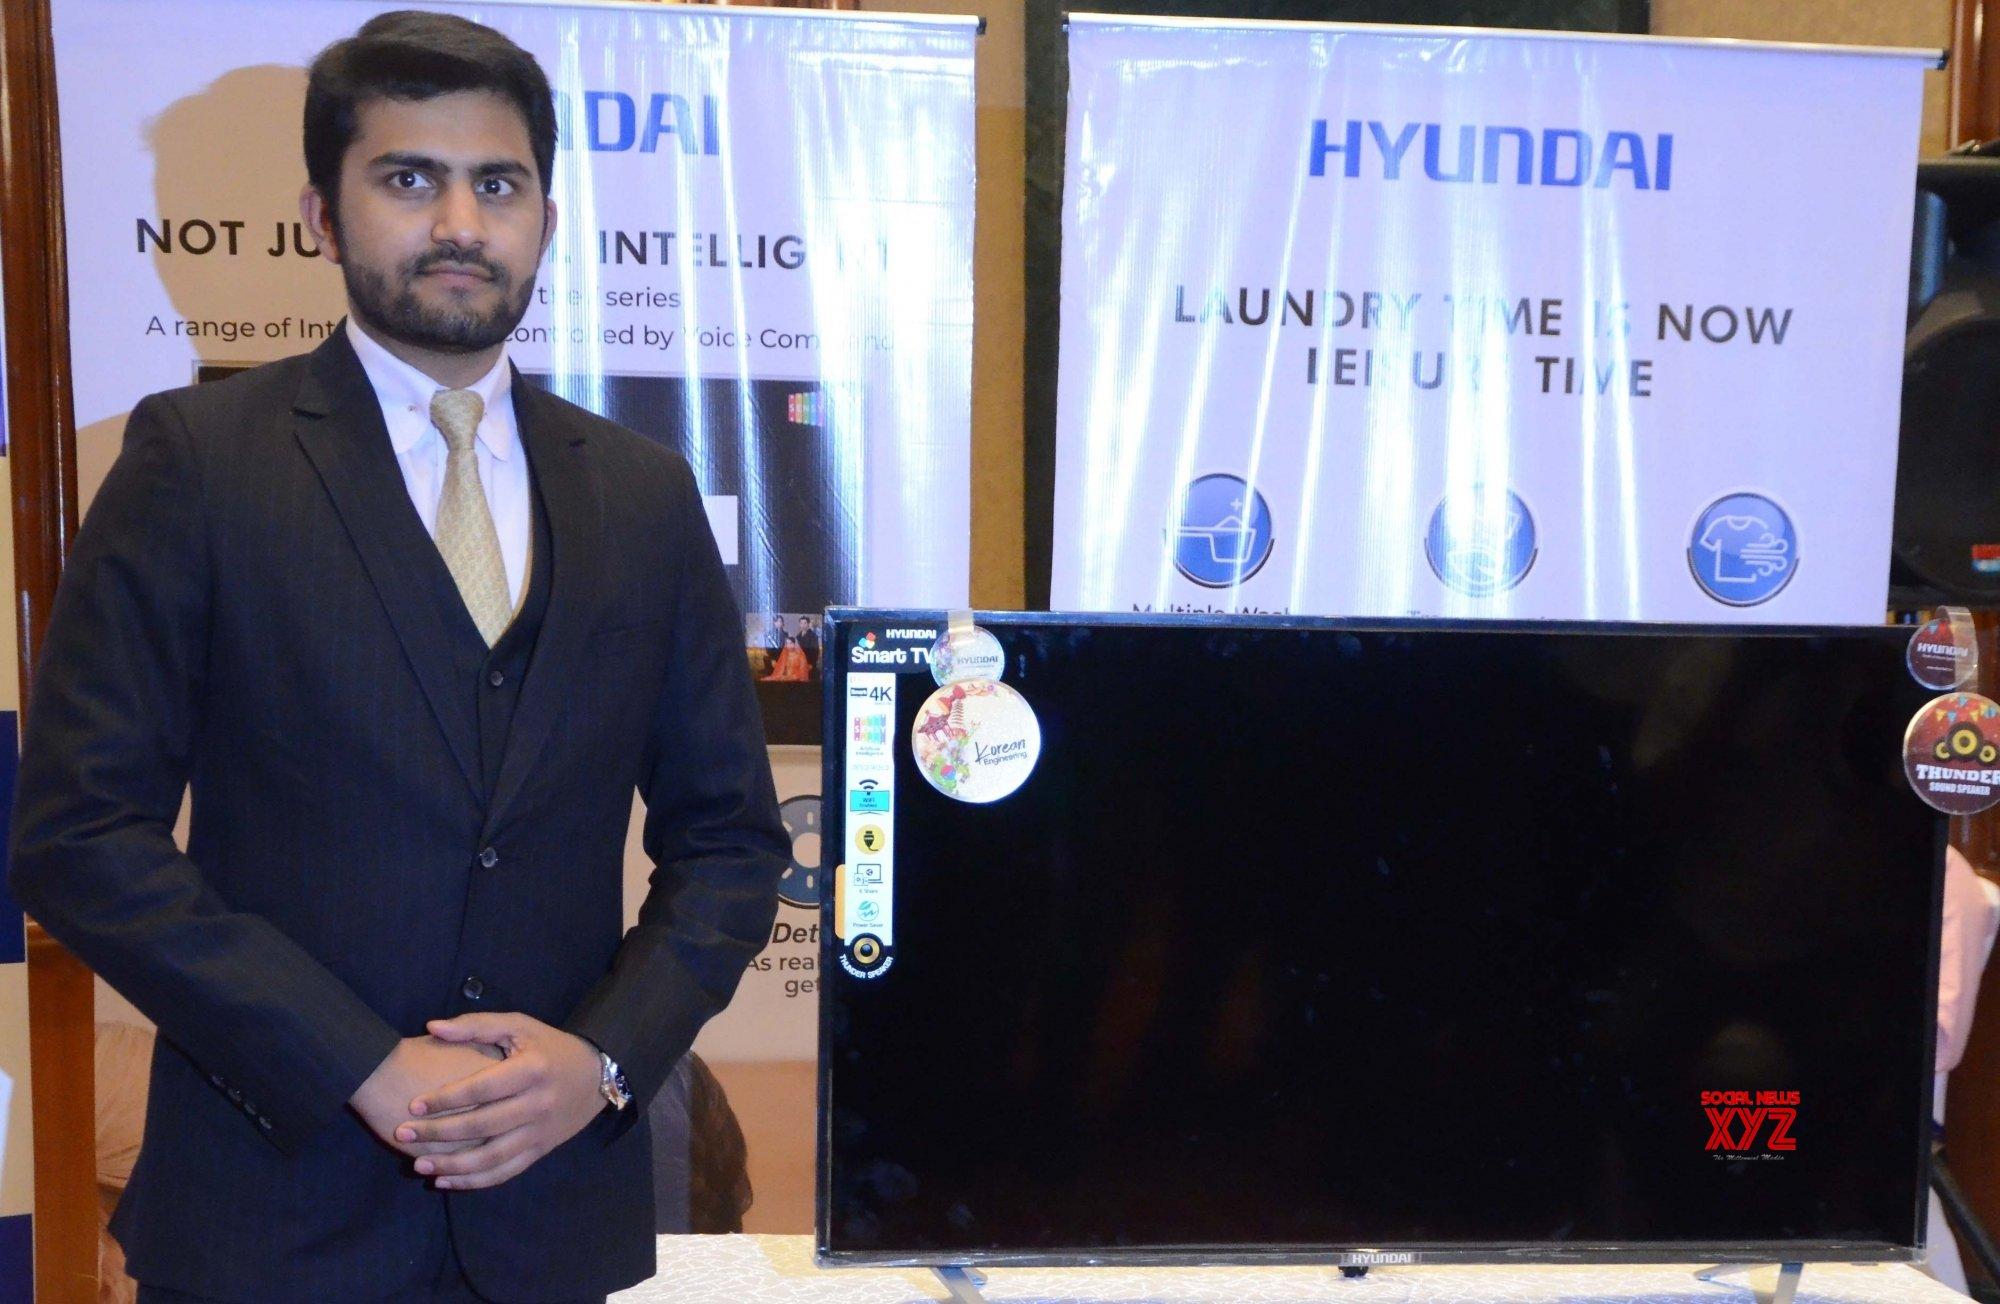 Mumbai: Hyundai Electronics launches new TV #Gallery